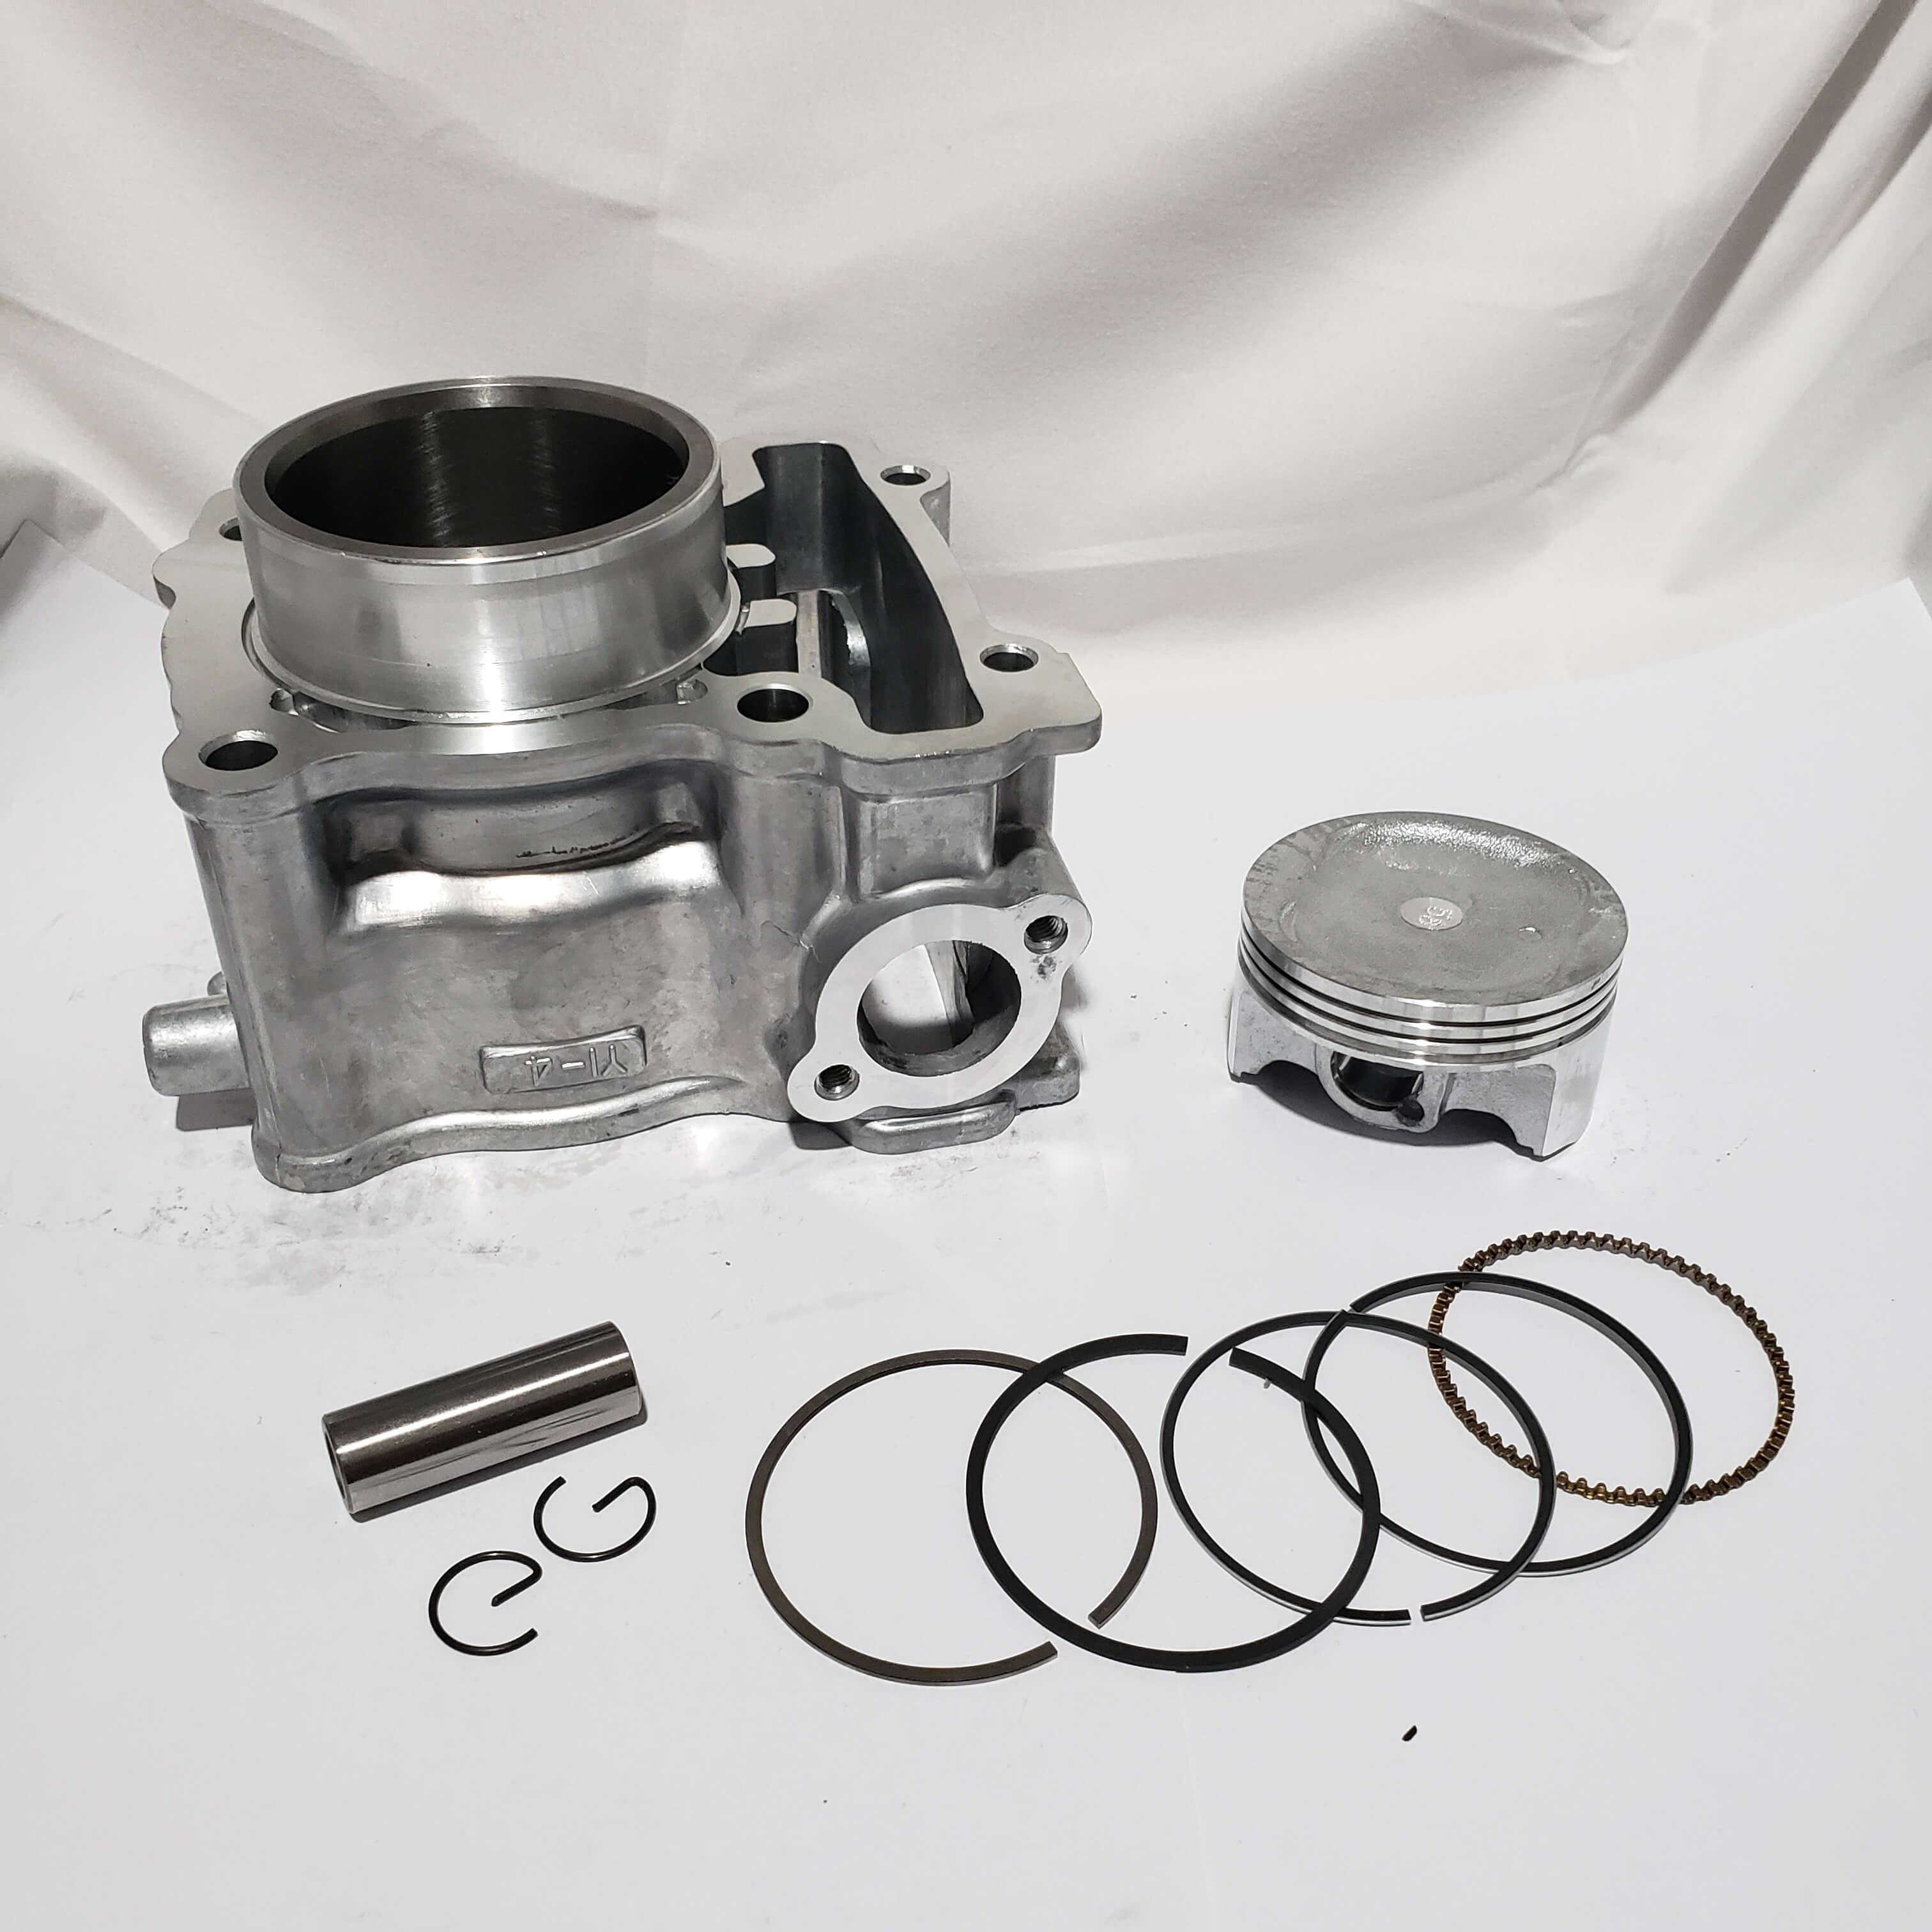 Seher Motor Nmax 62mm Buy Sepeda Motor Silinder Silinder Piston Nmax Product On Alibaba Com